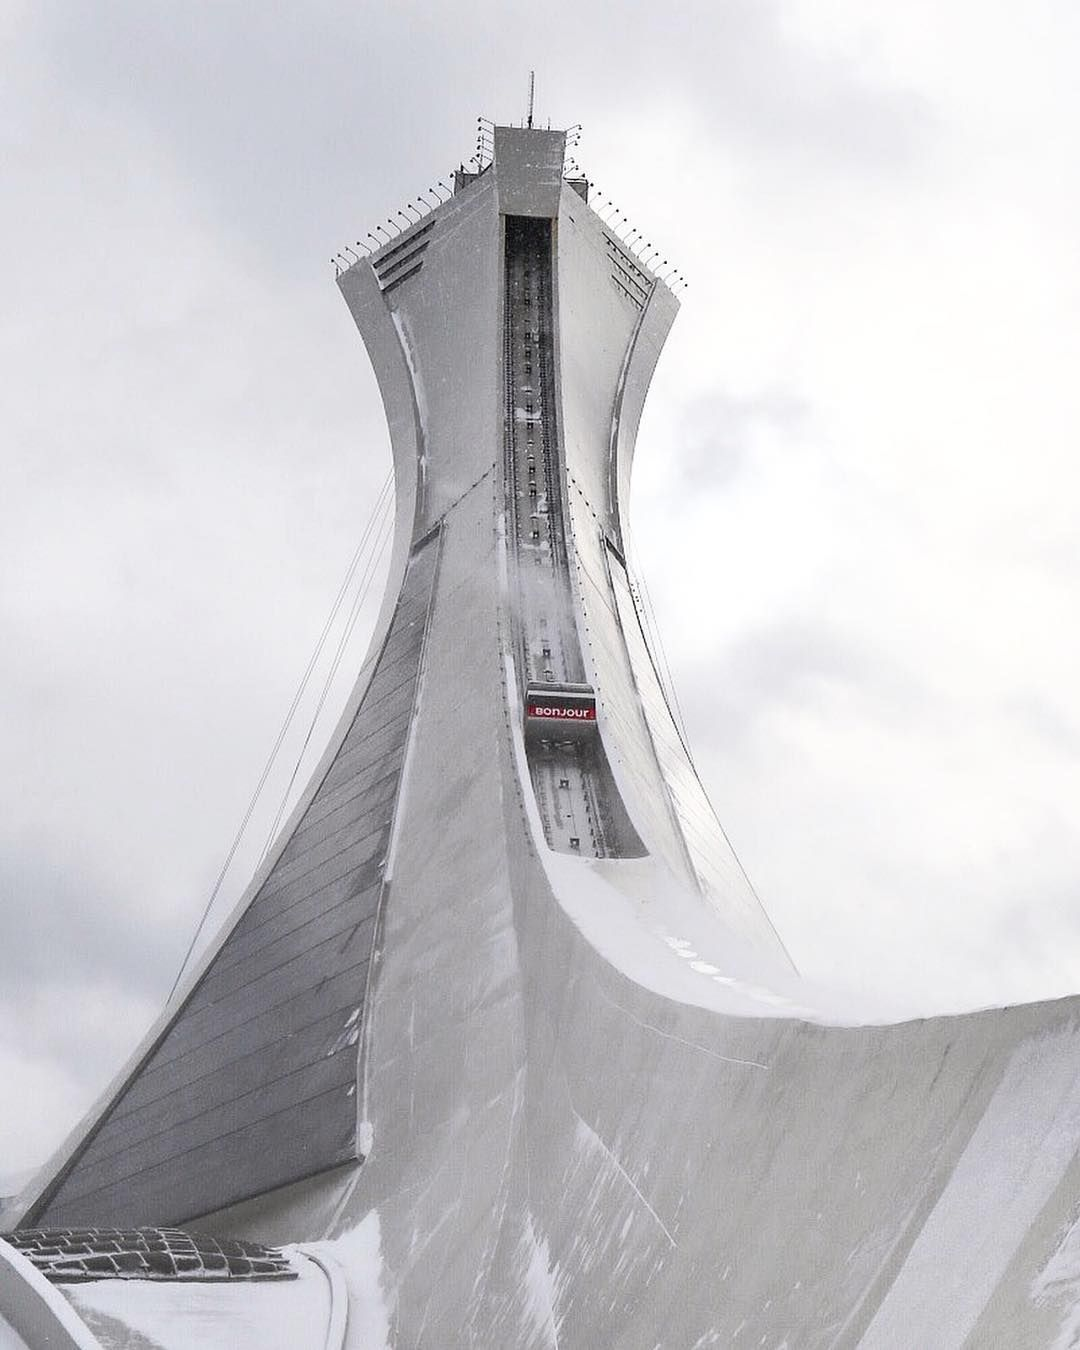 Pin By Ken Oks On Olympic Stadium Montreal 76 Olympic Stadium Montreal Montreal Stadium